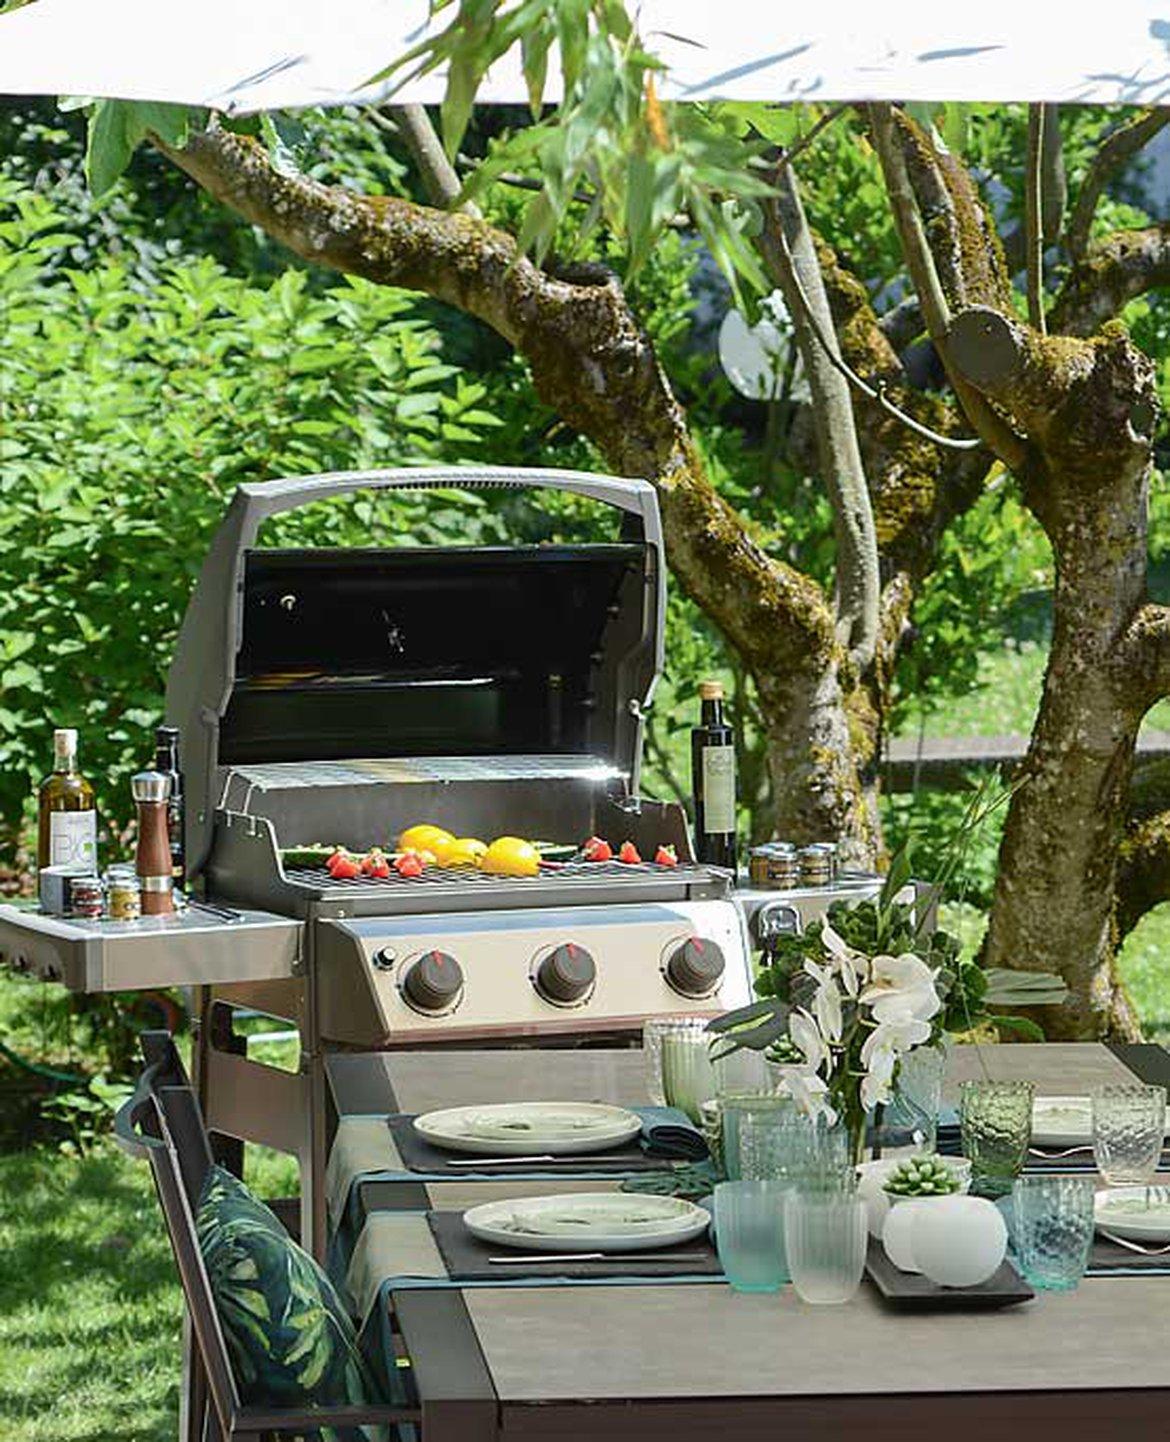 Garden Centre Schilliger : Jardinerie, mobilier, décoration ...